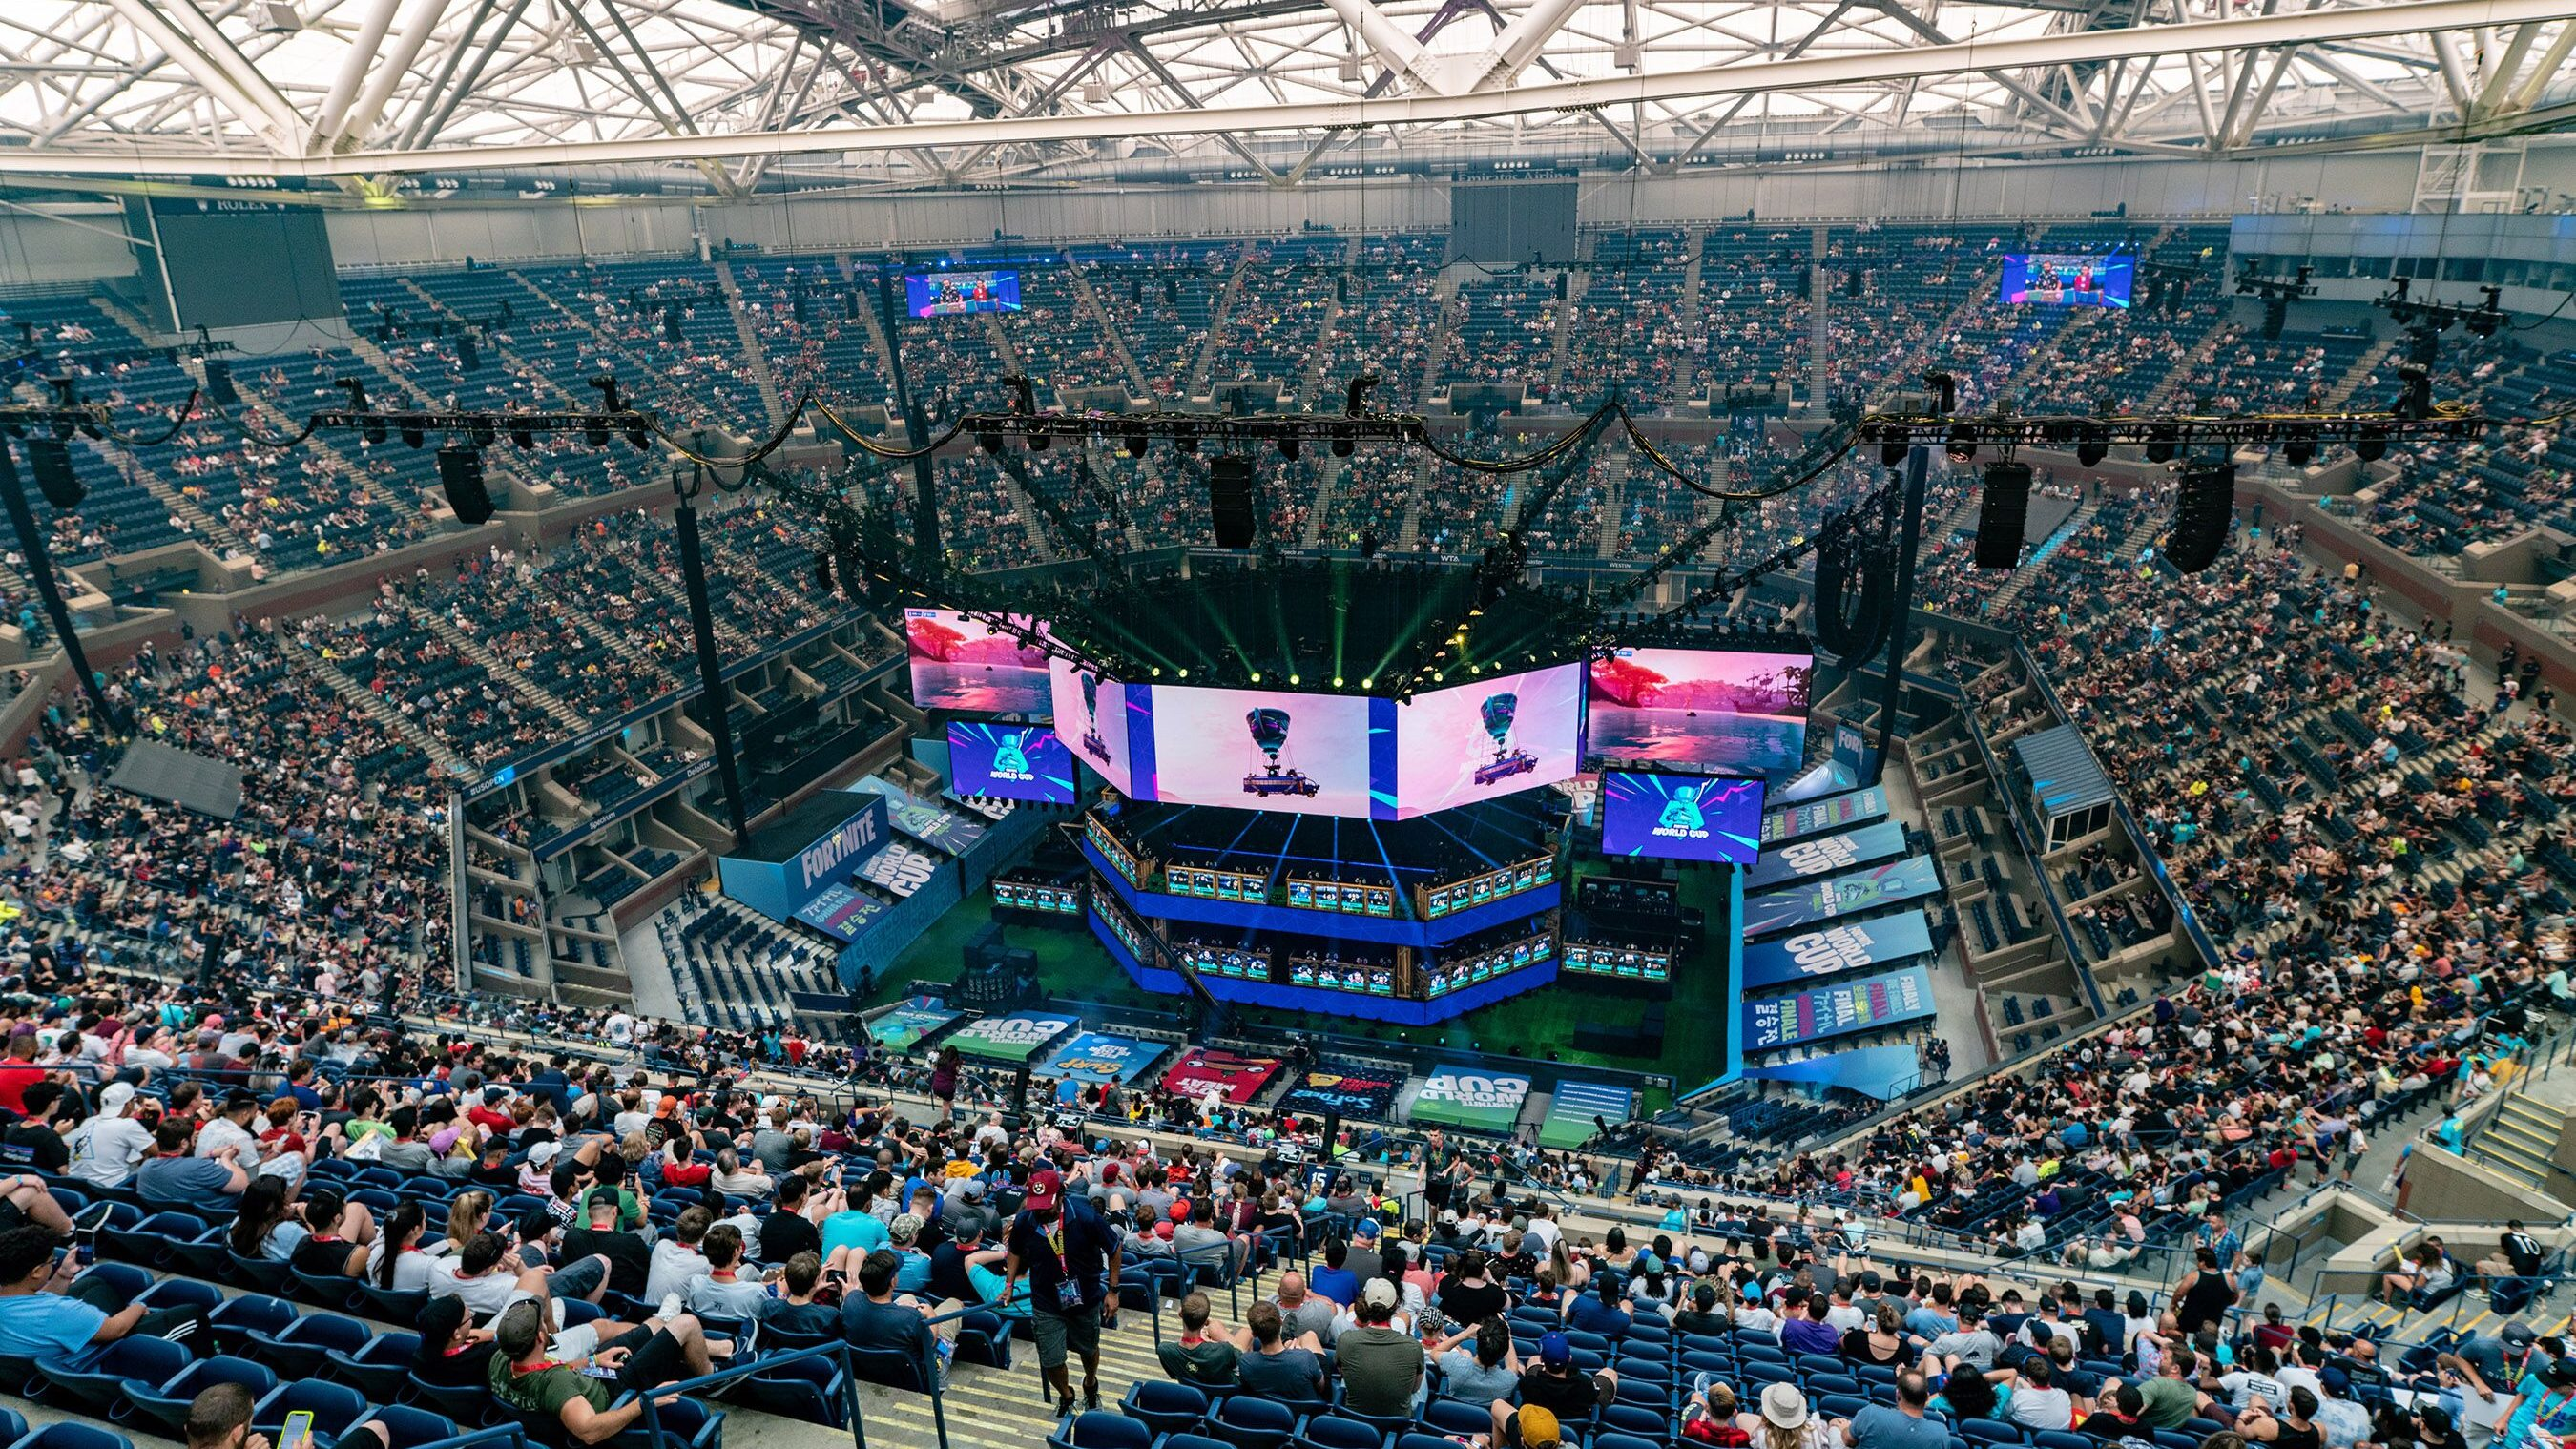 Pemain Rusia dihapus dari pertandingan selama Fortnite Piala Dunia untuk menonton layar 1